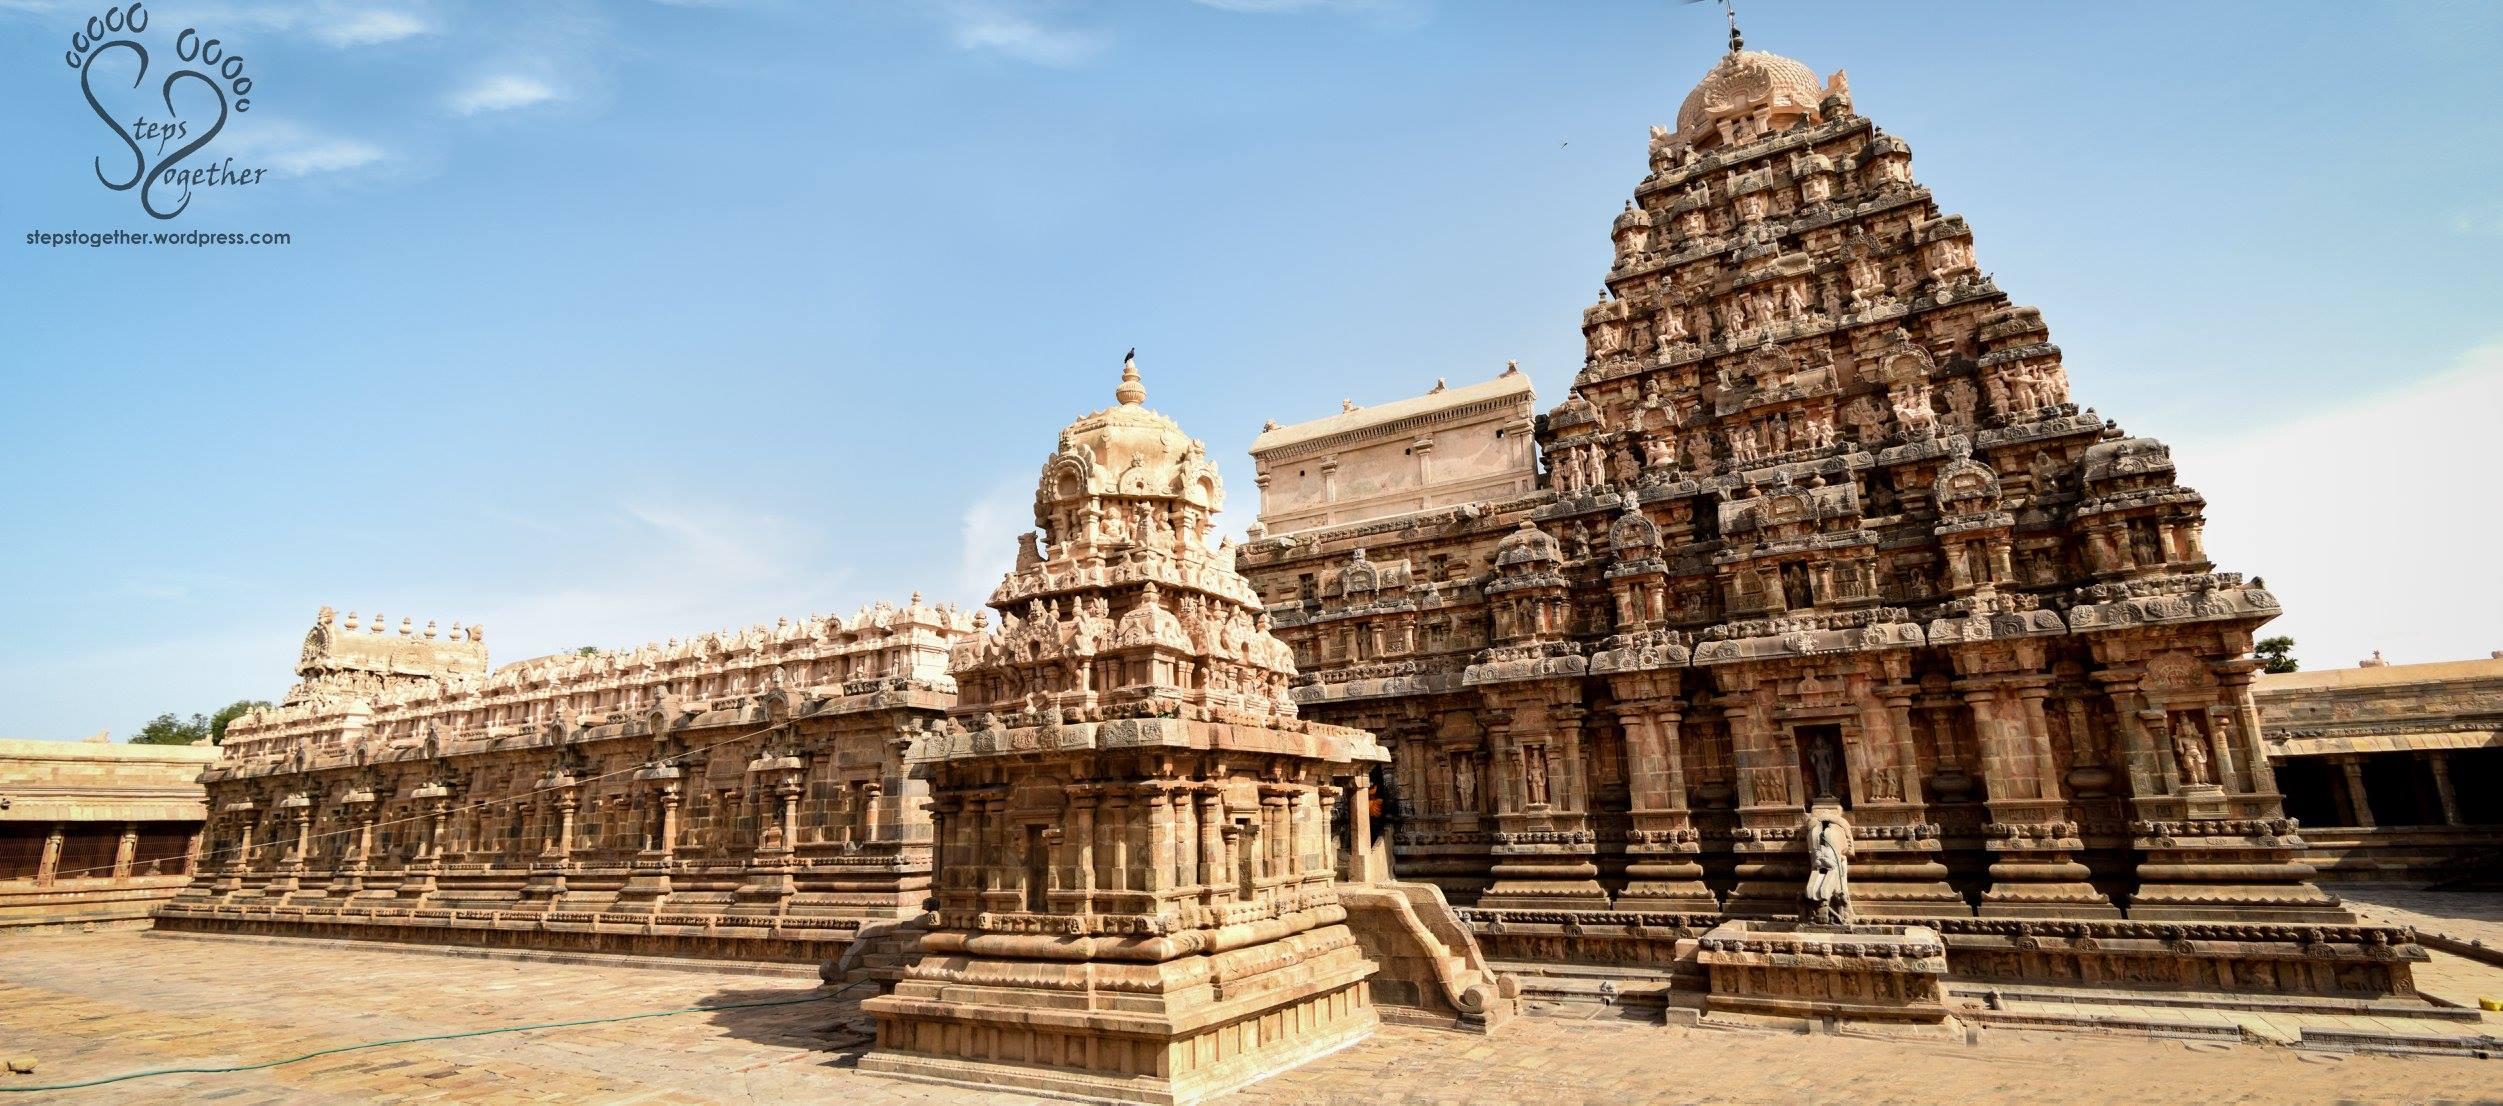 Airavateshwara Temple, Darasuram